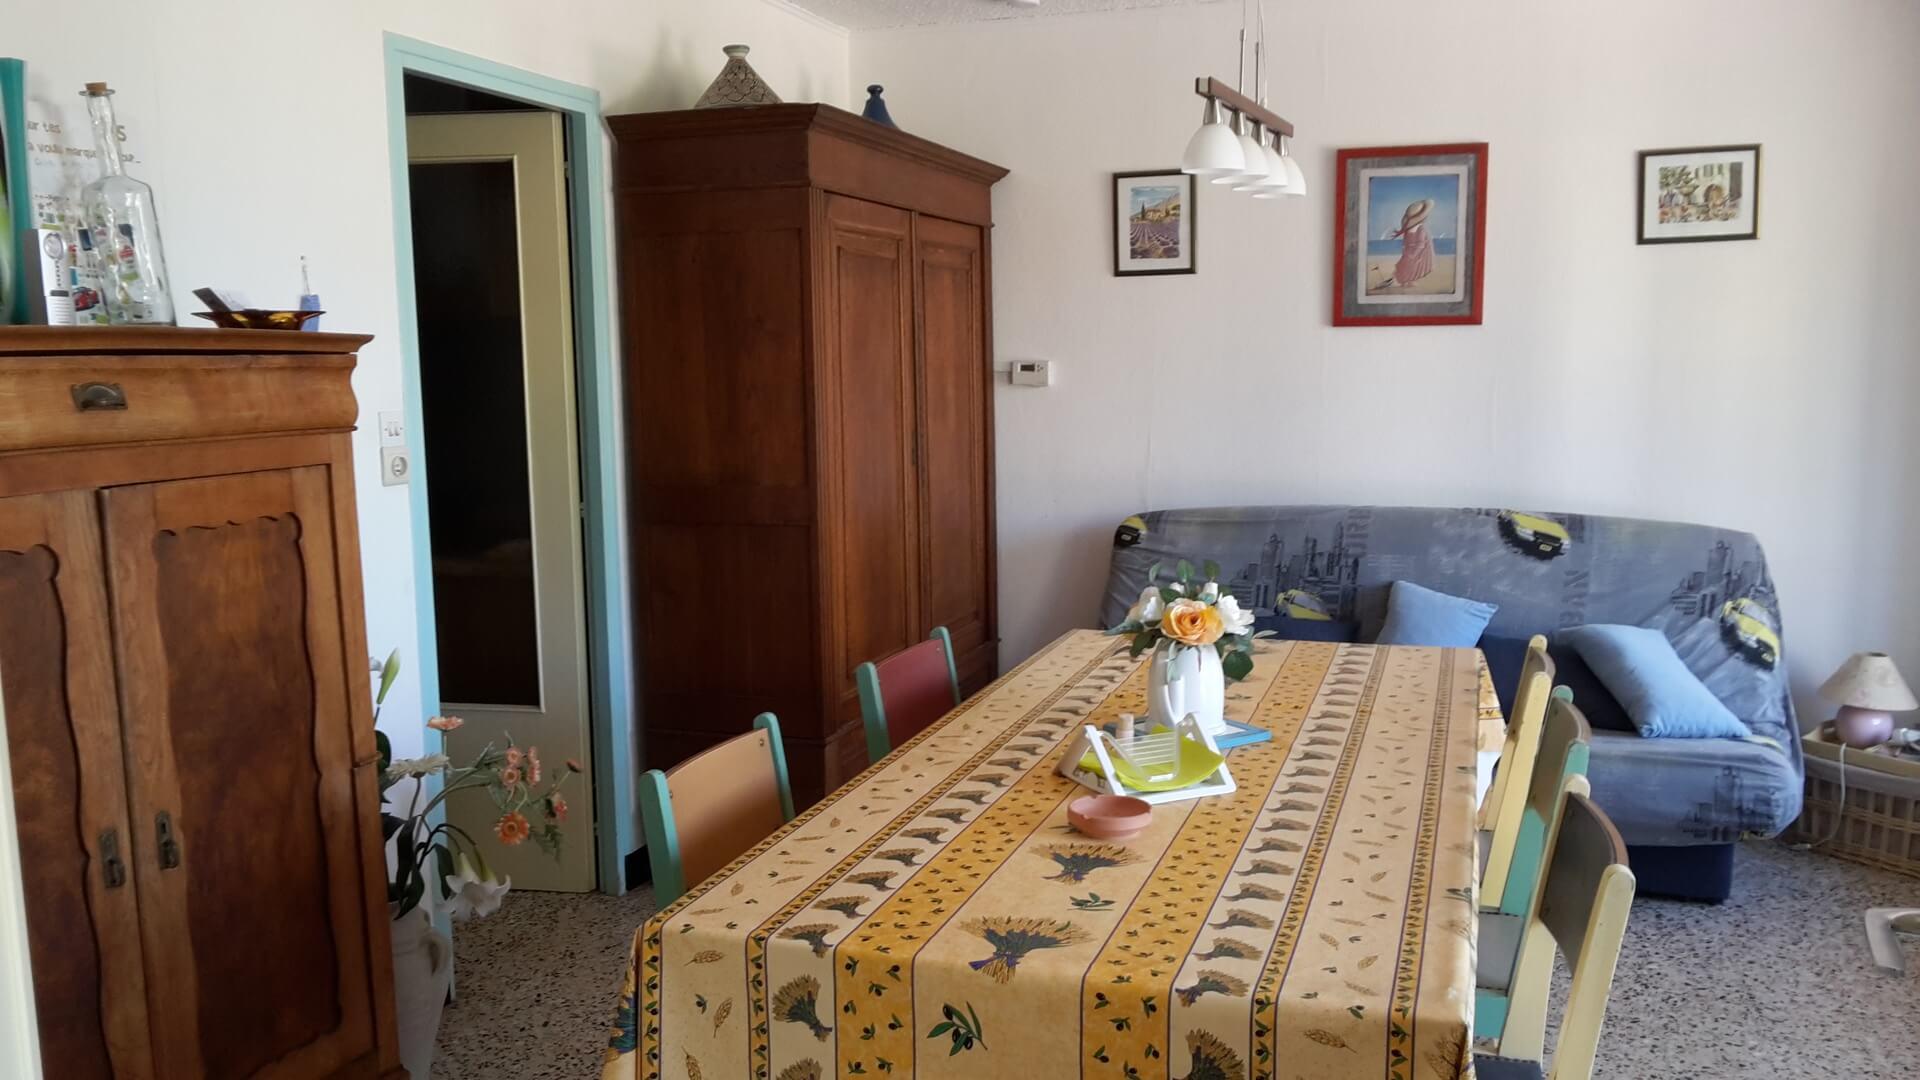 Homki - Vente Maison/villa  de 160.0 m² à Mornas 84550